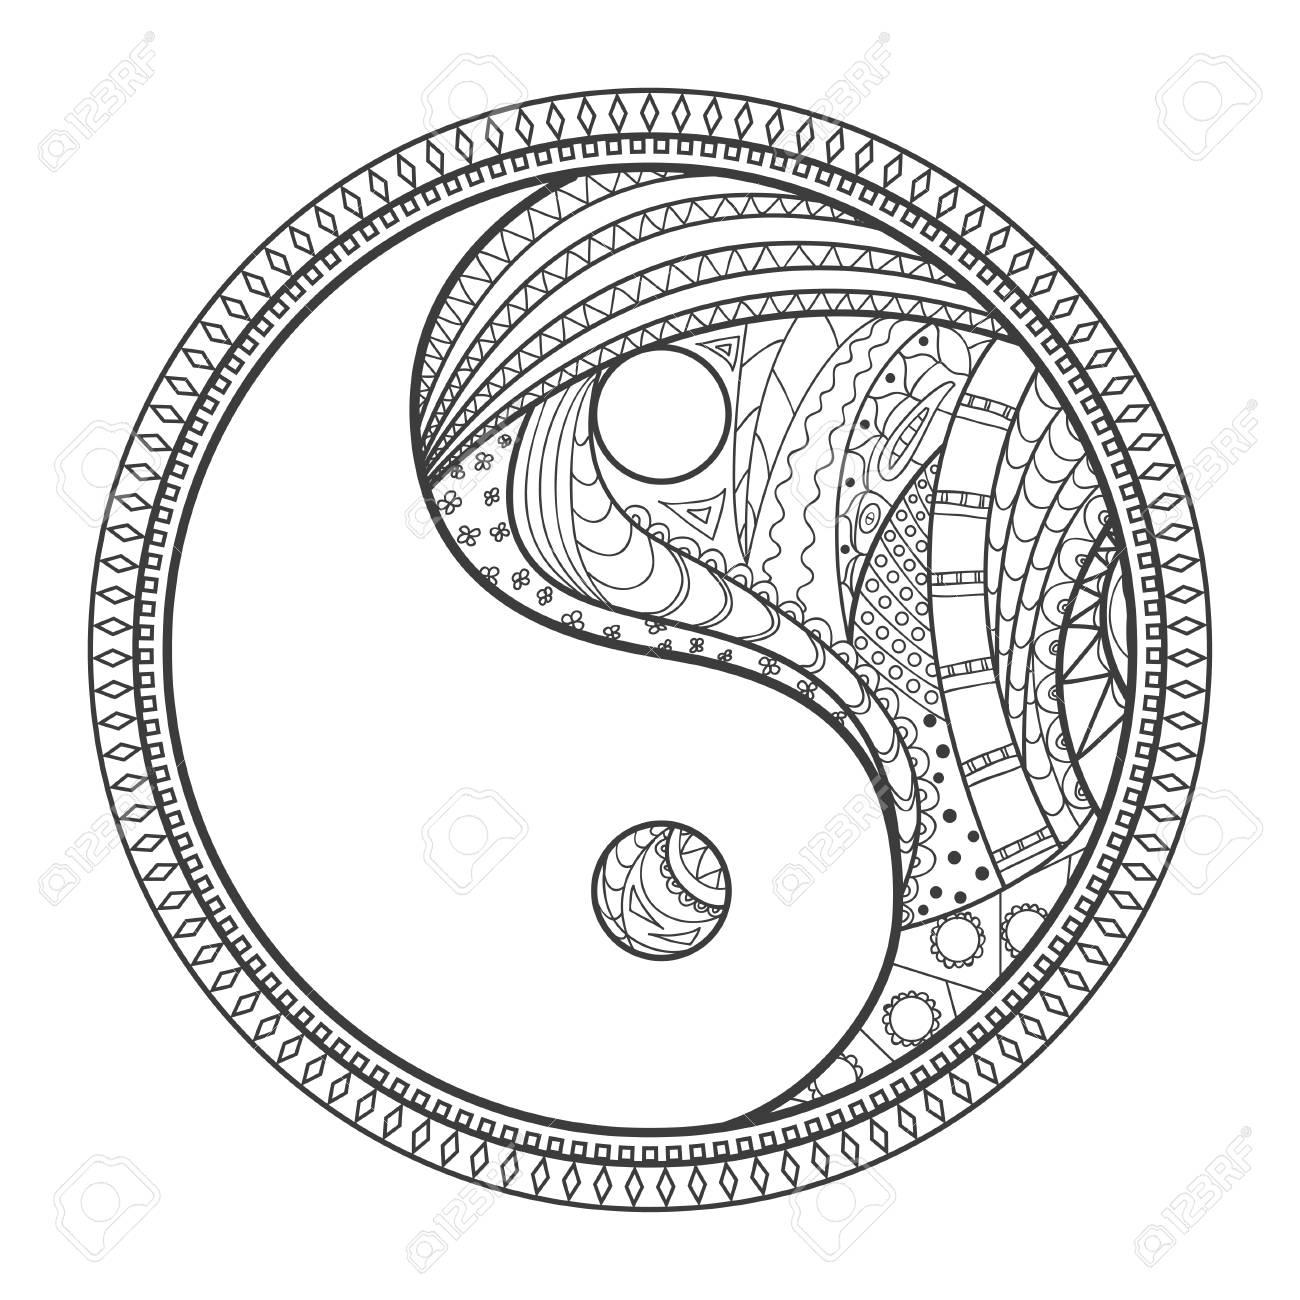 Yin Und Yang Religionssymbol Zentangle Hand Gezeichnete Mandala